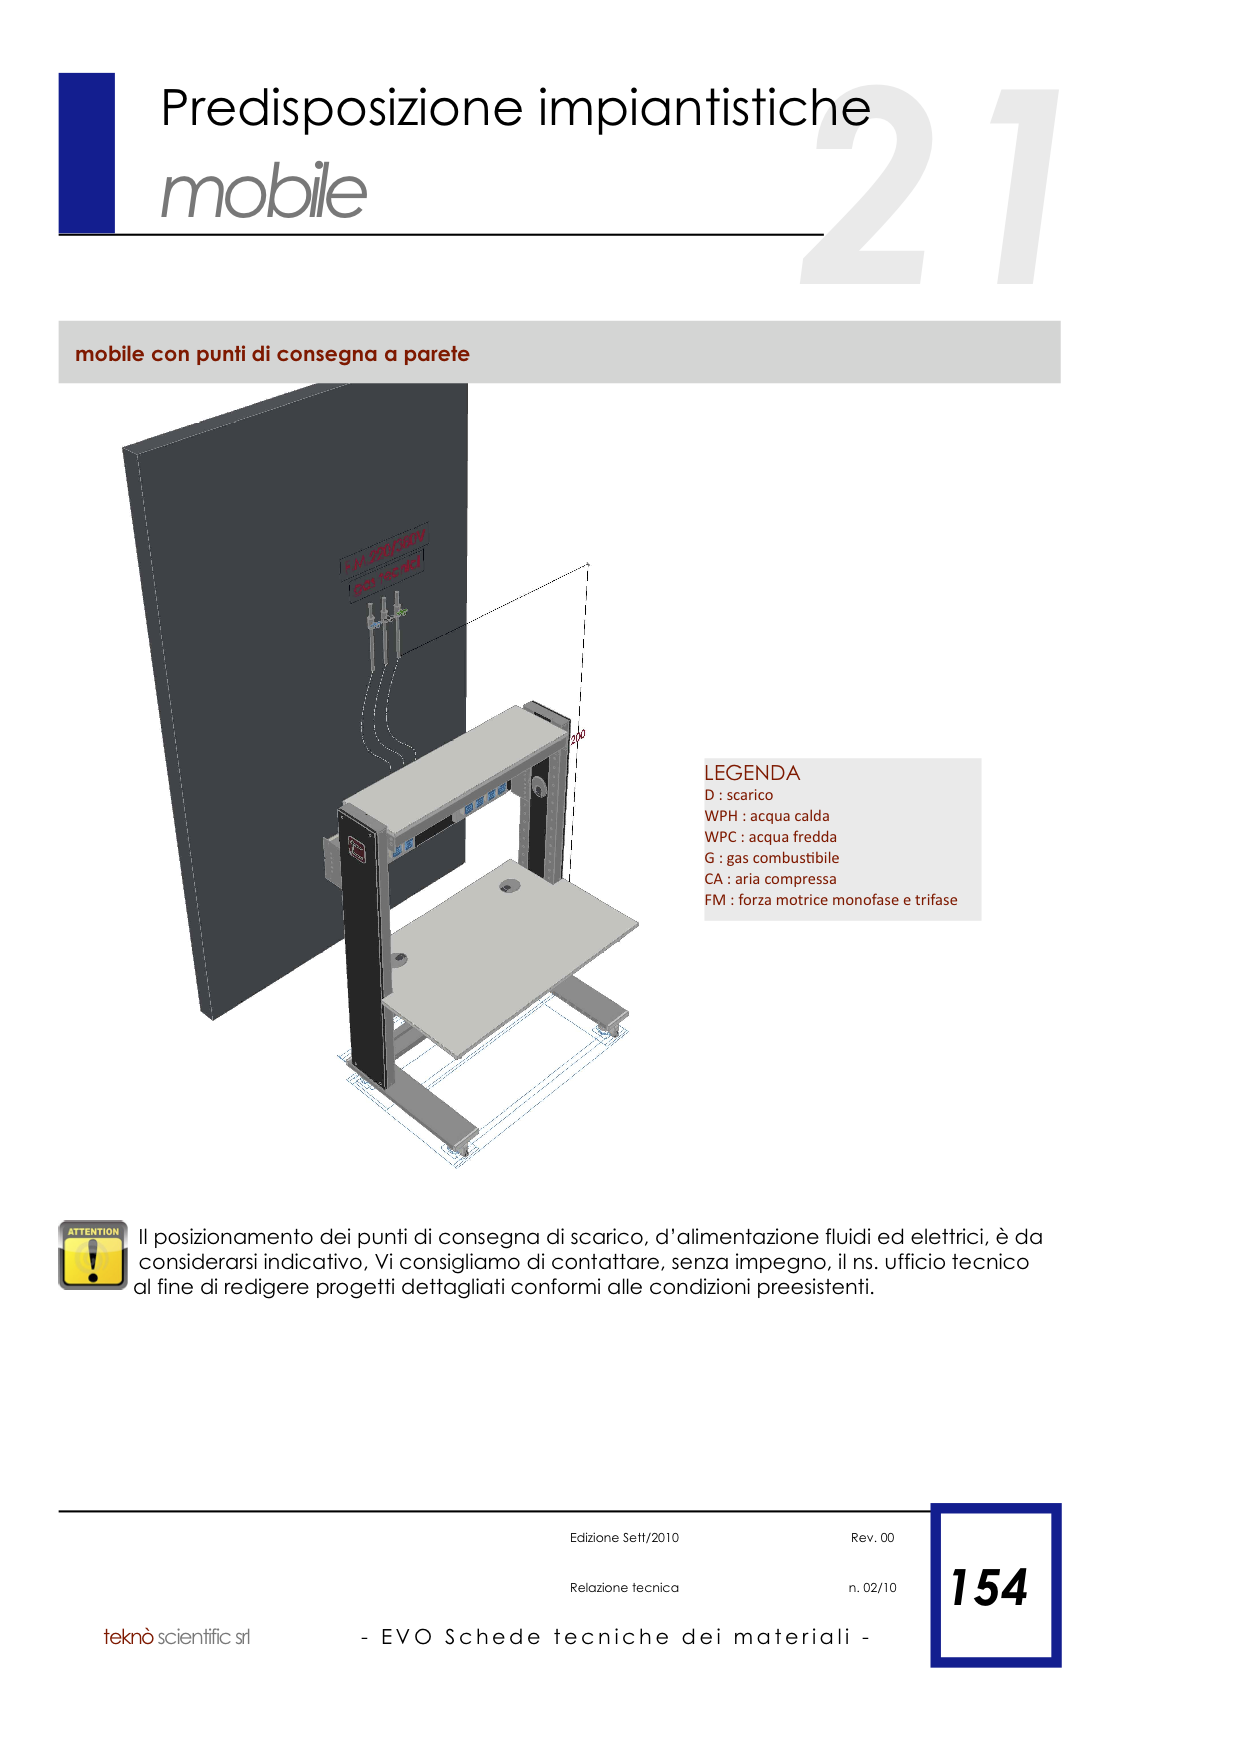 EVO Schede Tecniche materiali copia 14.png